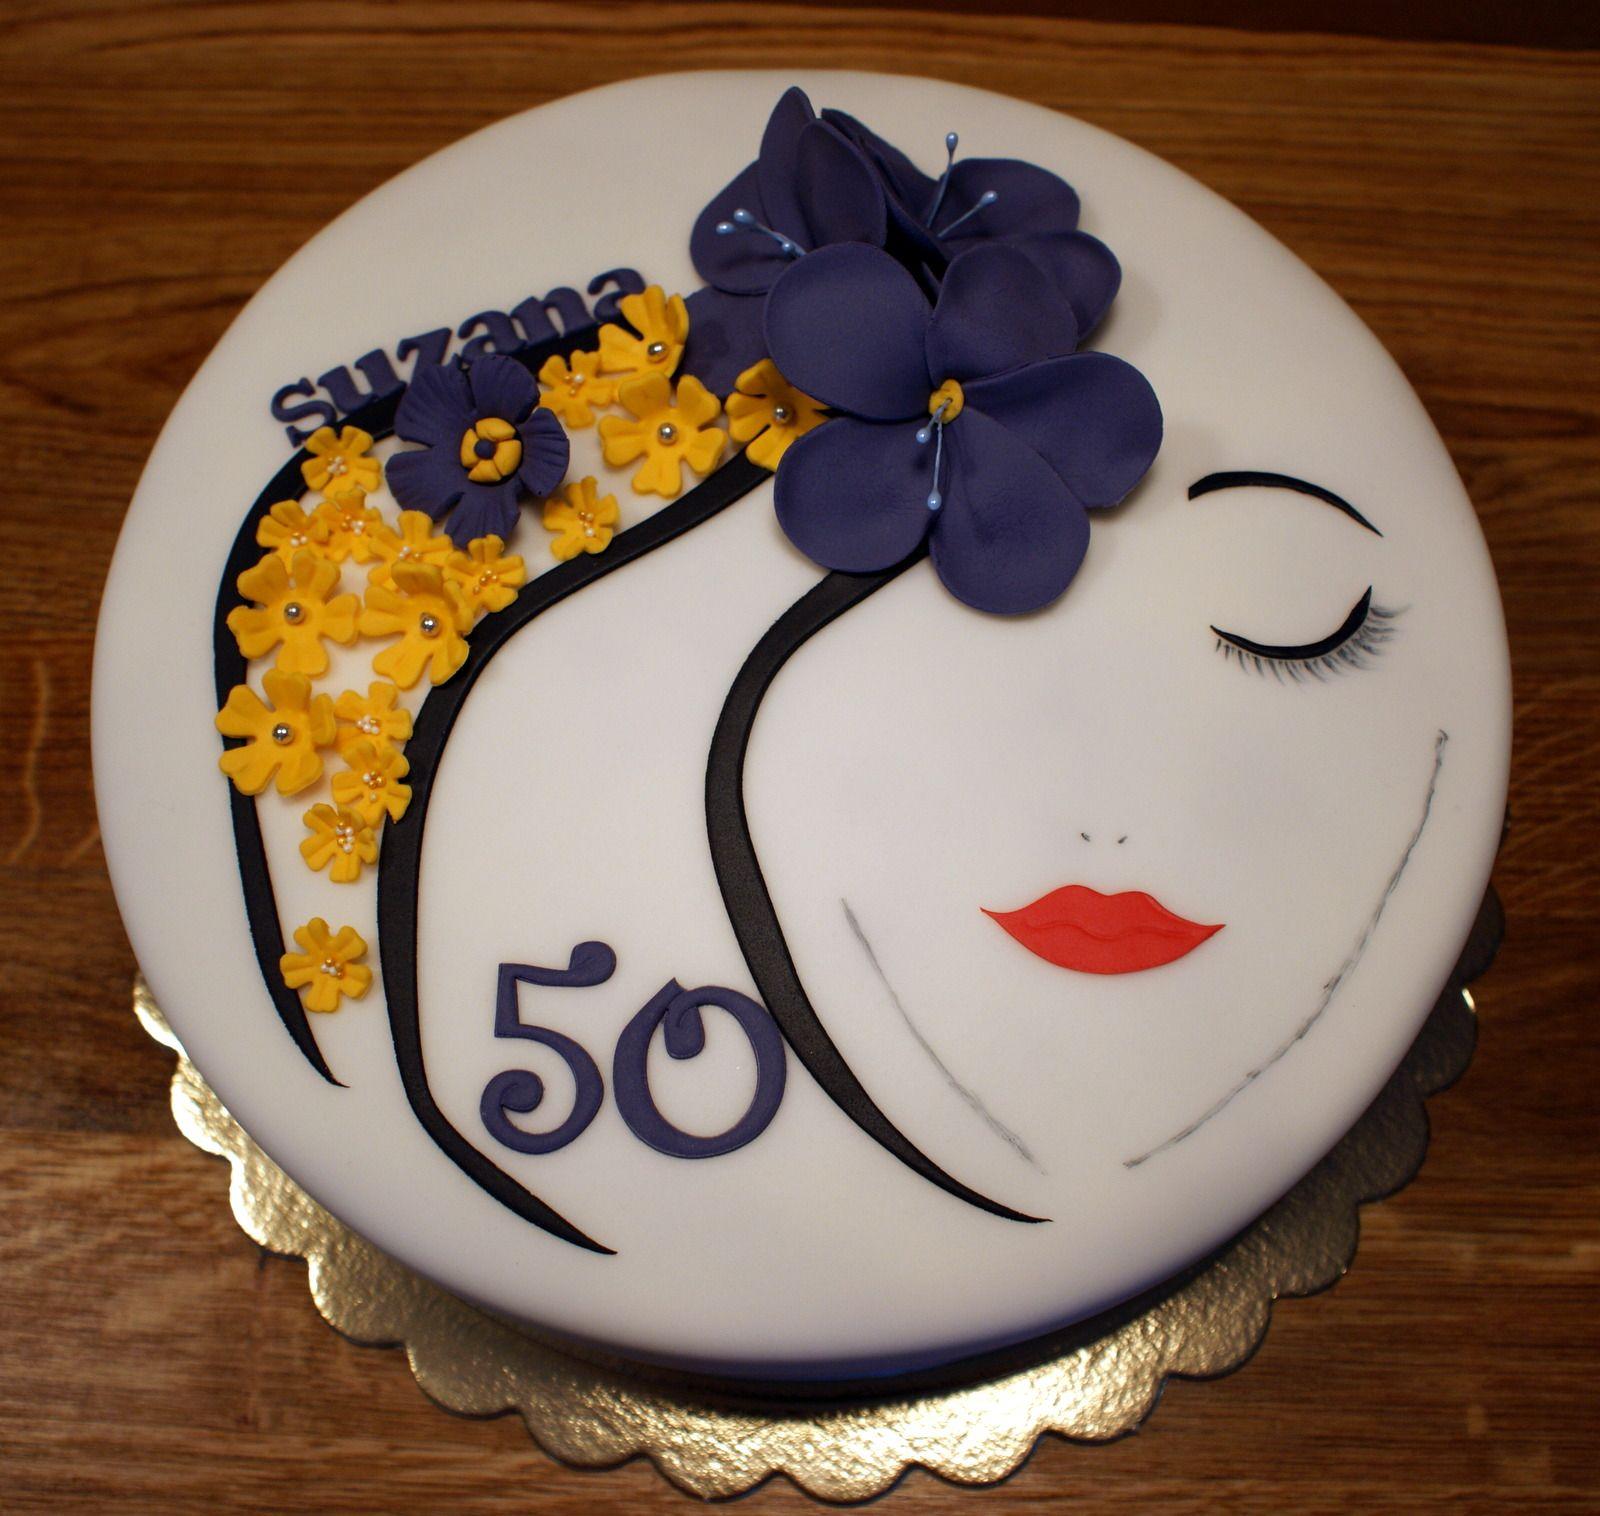 Lady S Face Cake My Cakes Cake Buttercream Cake Cake